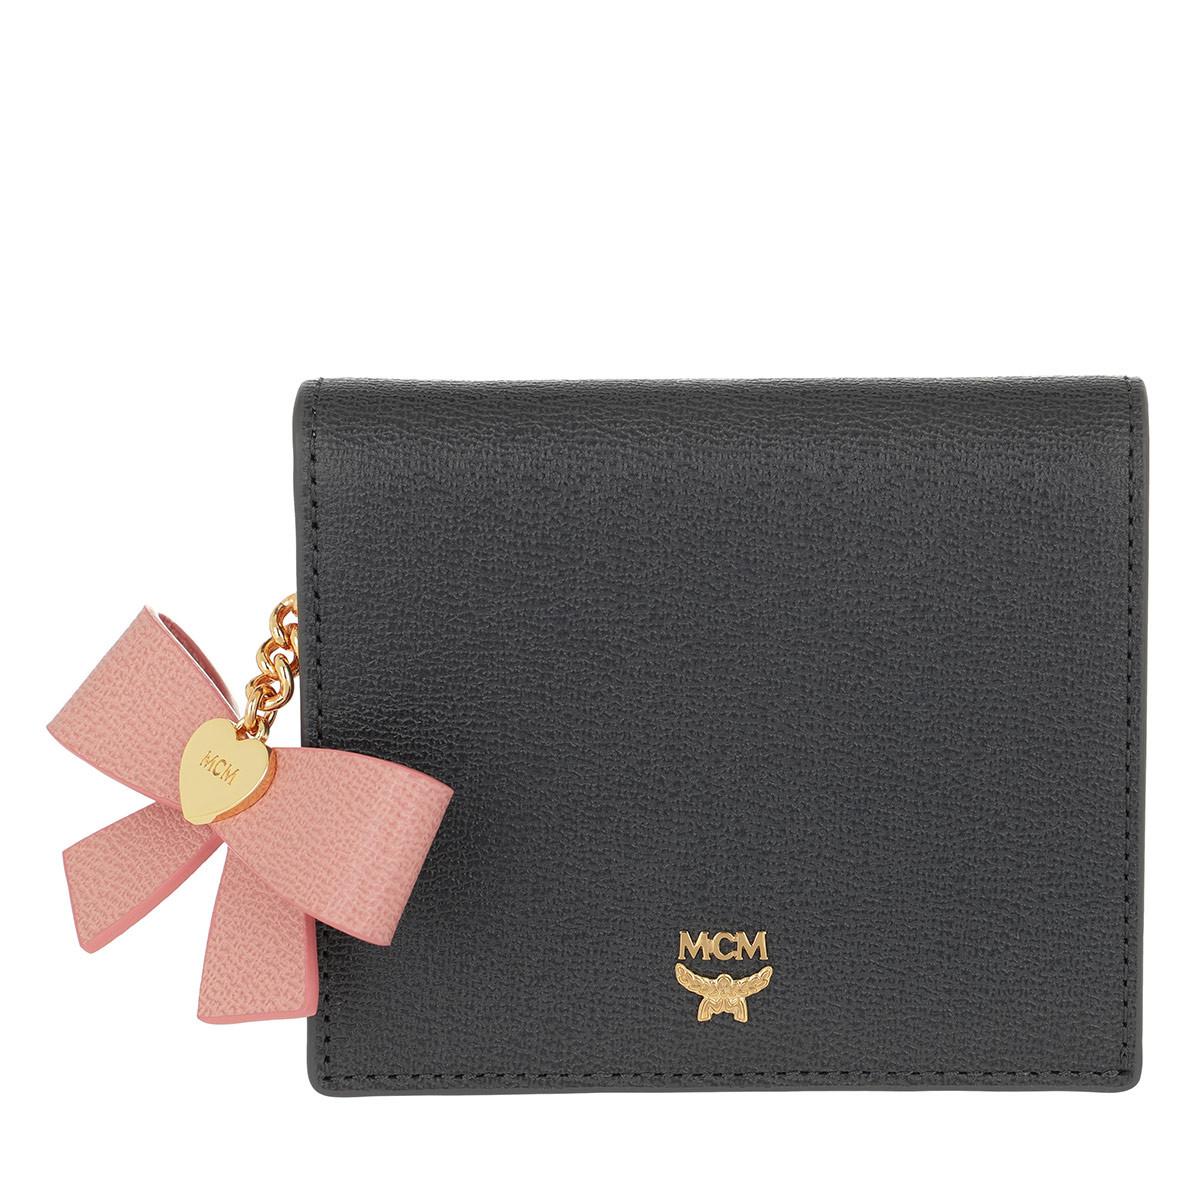 MCM Portemonnaie - Mina Bow Charm Flap Wallet Mini Phantom Grey - in grau - für Damen